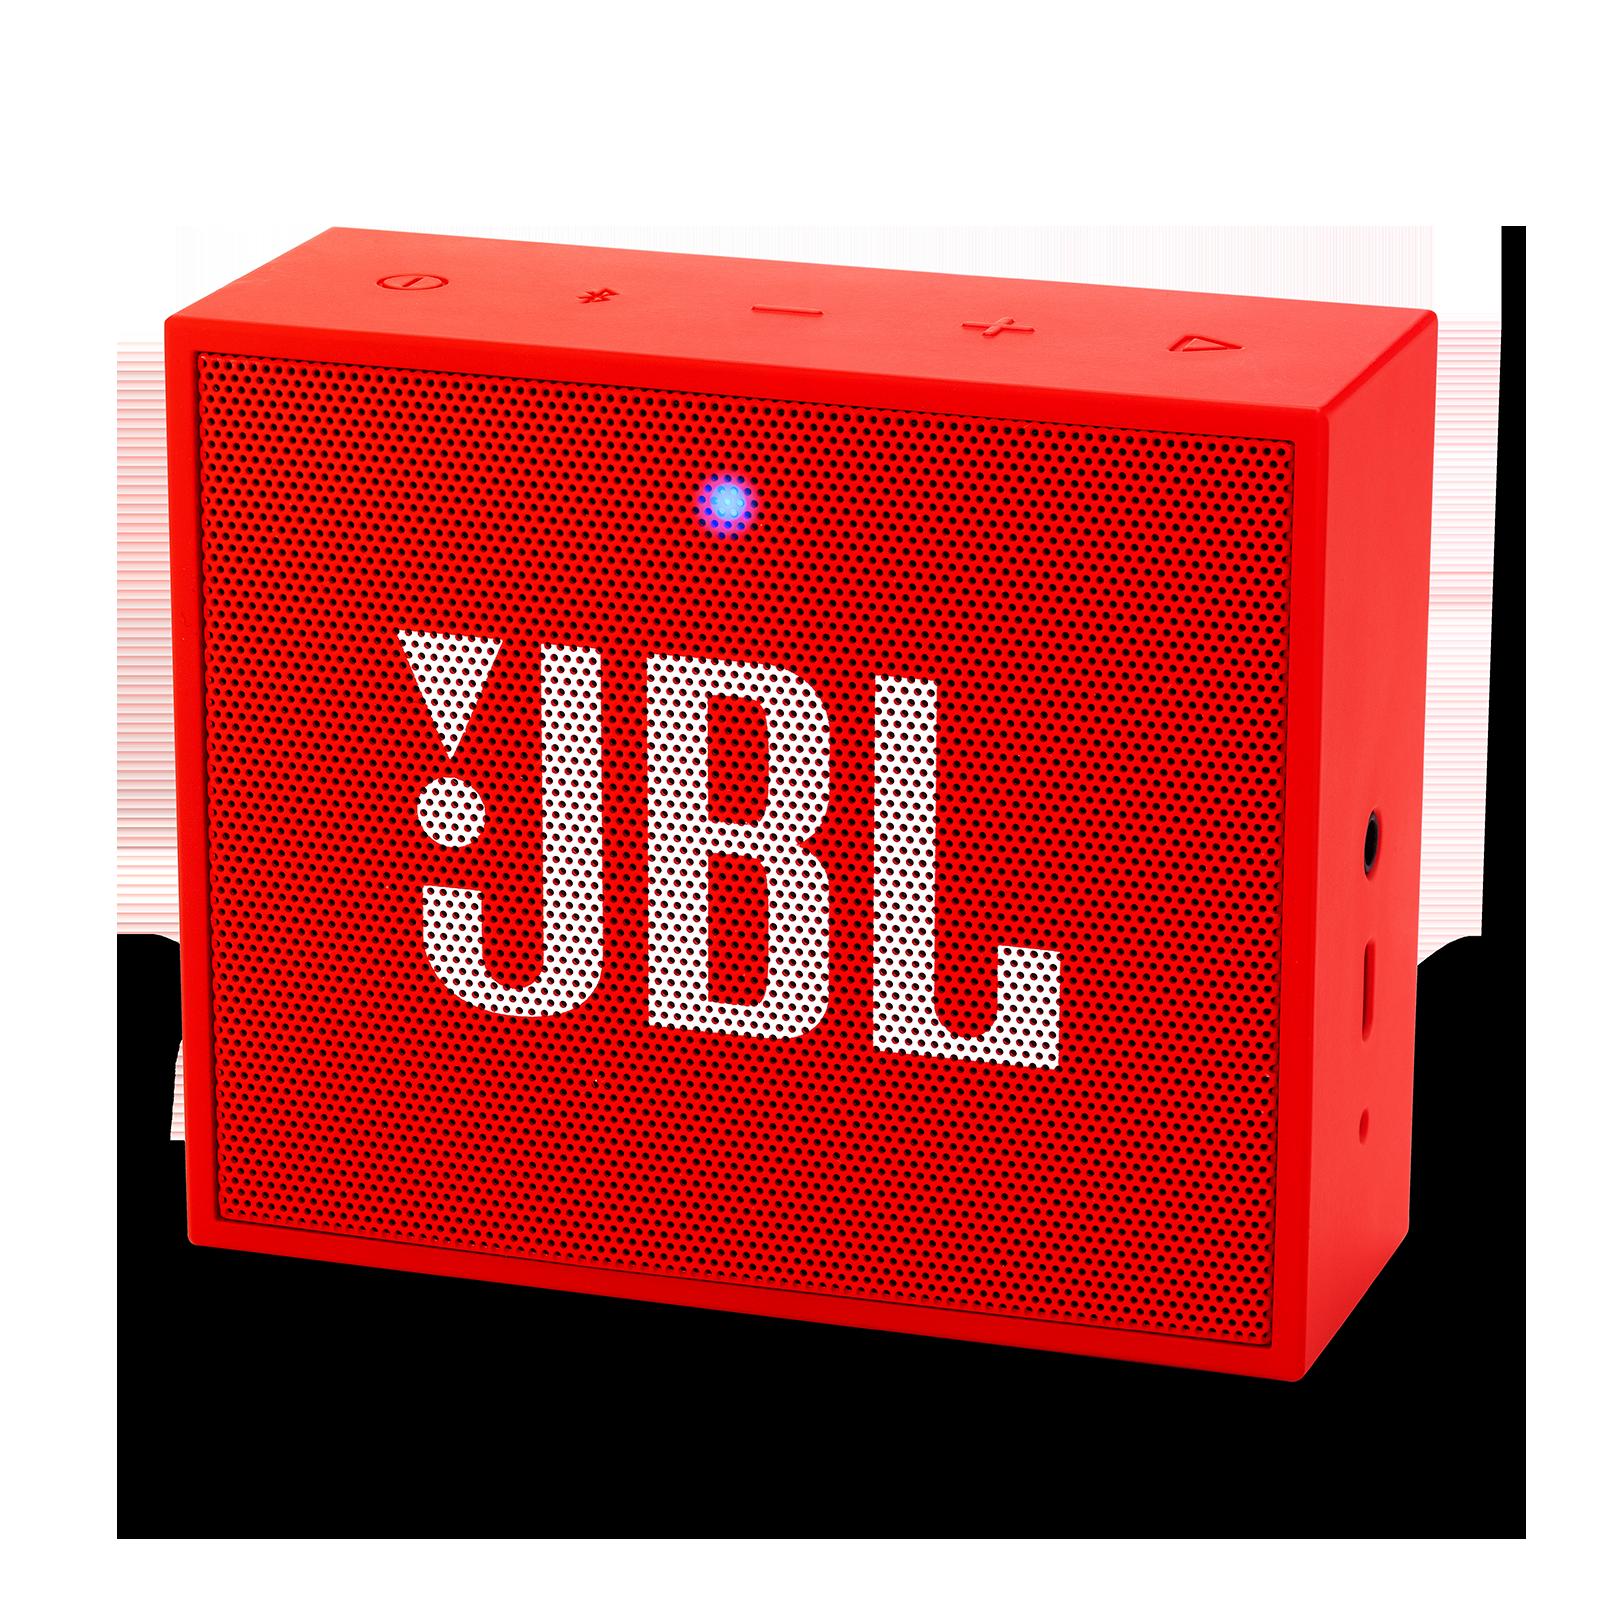 Enceinte Jbl Salle De Bain ~ jbl go enceinte bluetooth portable